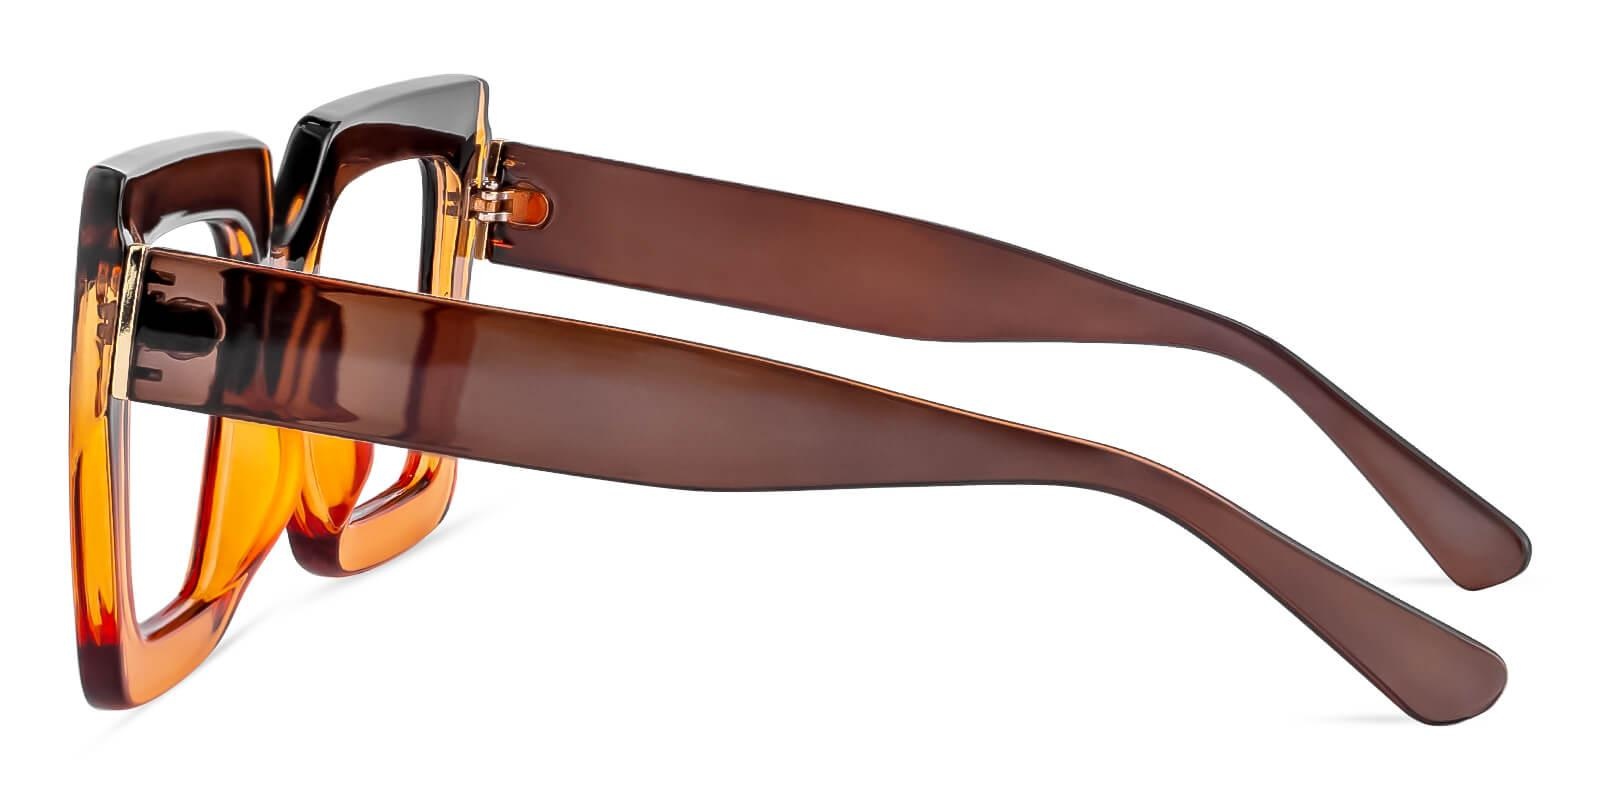 Morrison Gray Plastic Eyeglasses , Fashion , UniversalBridgeFit Frames from ABBE Glasses